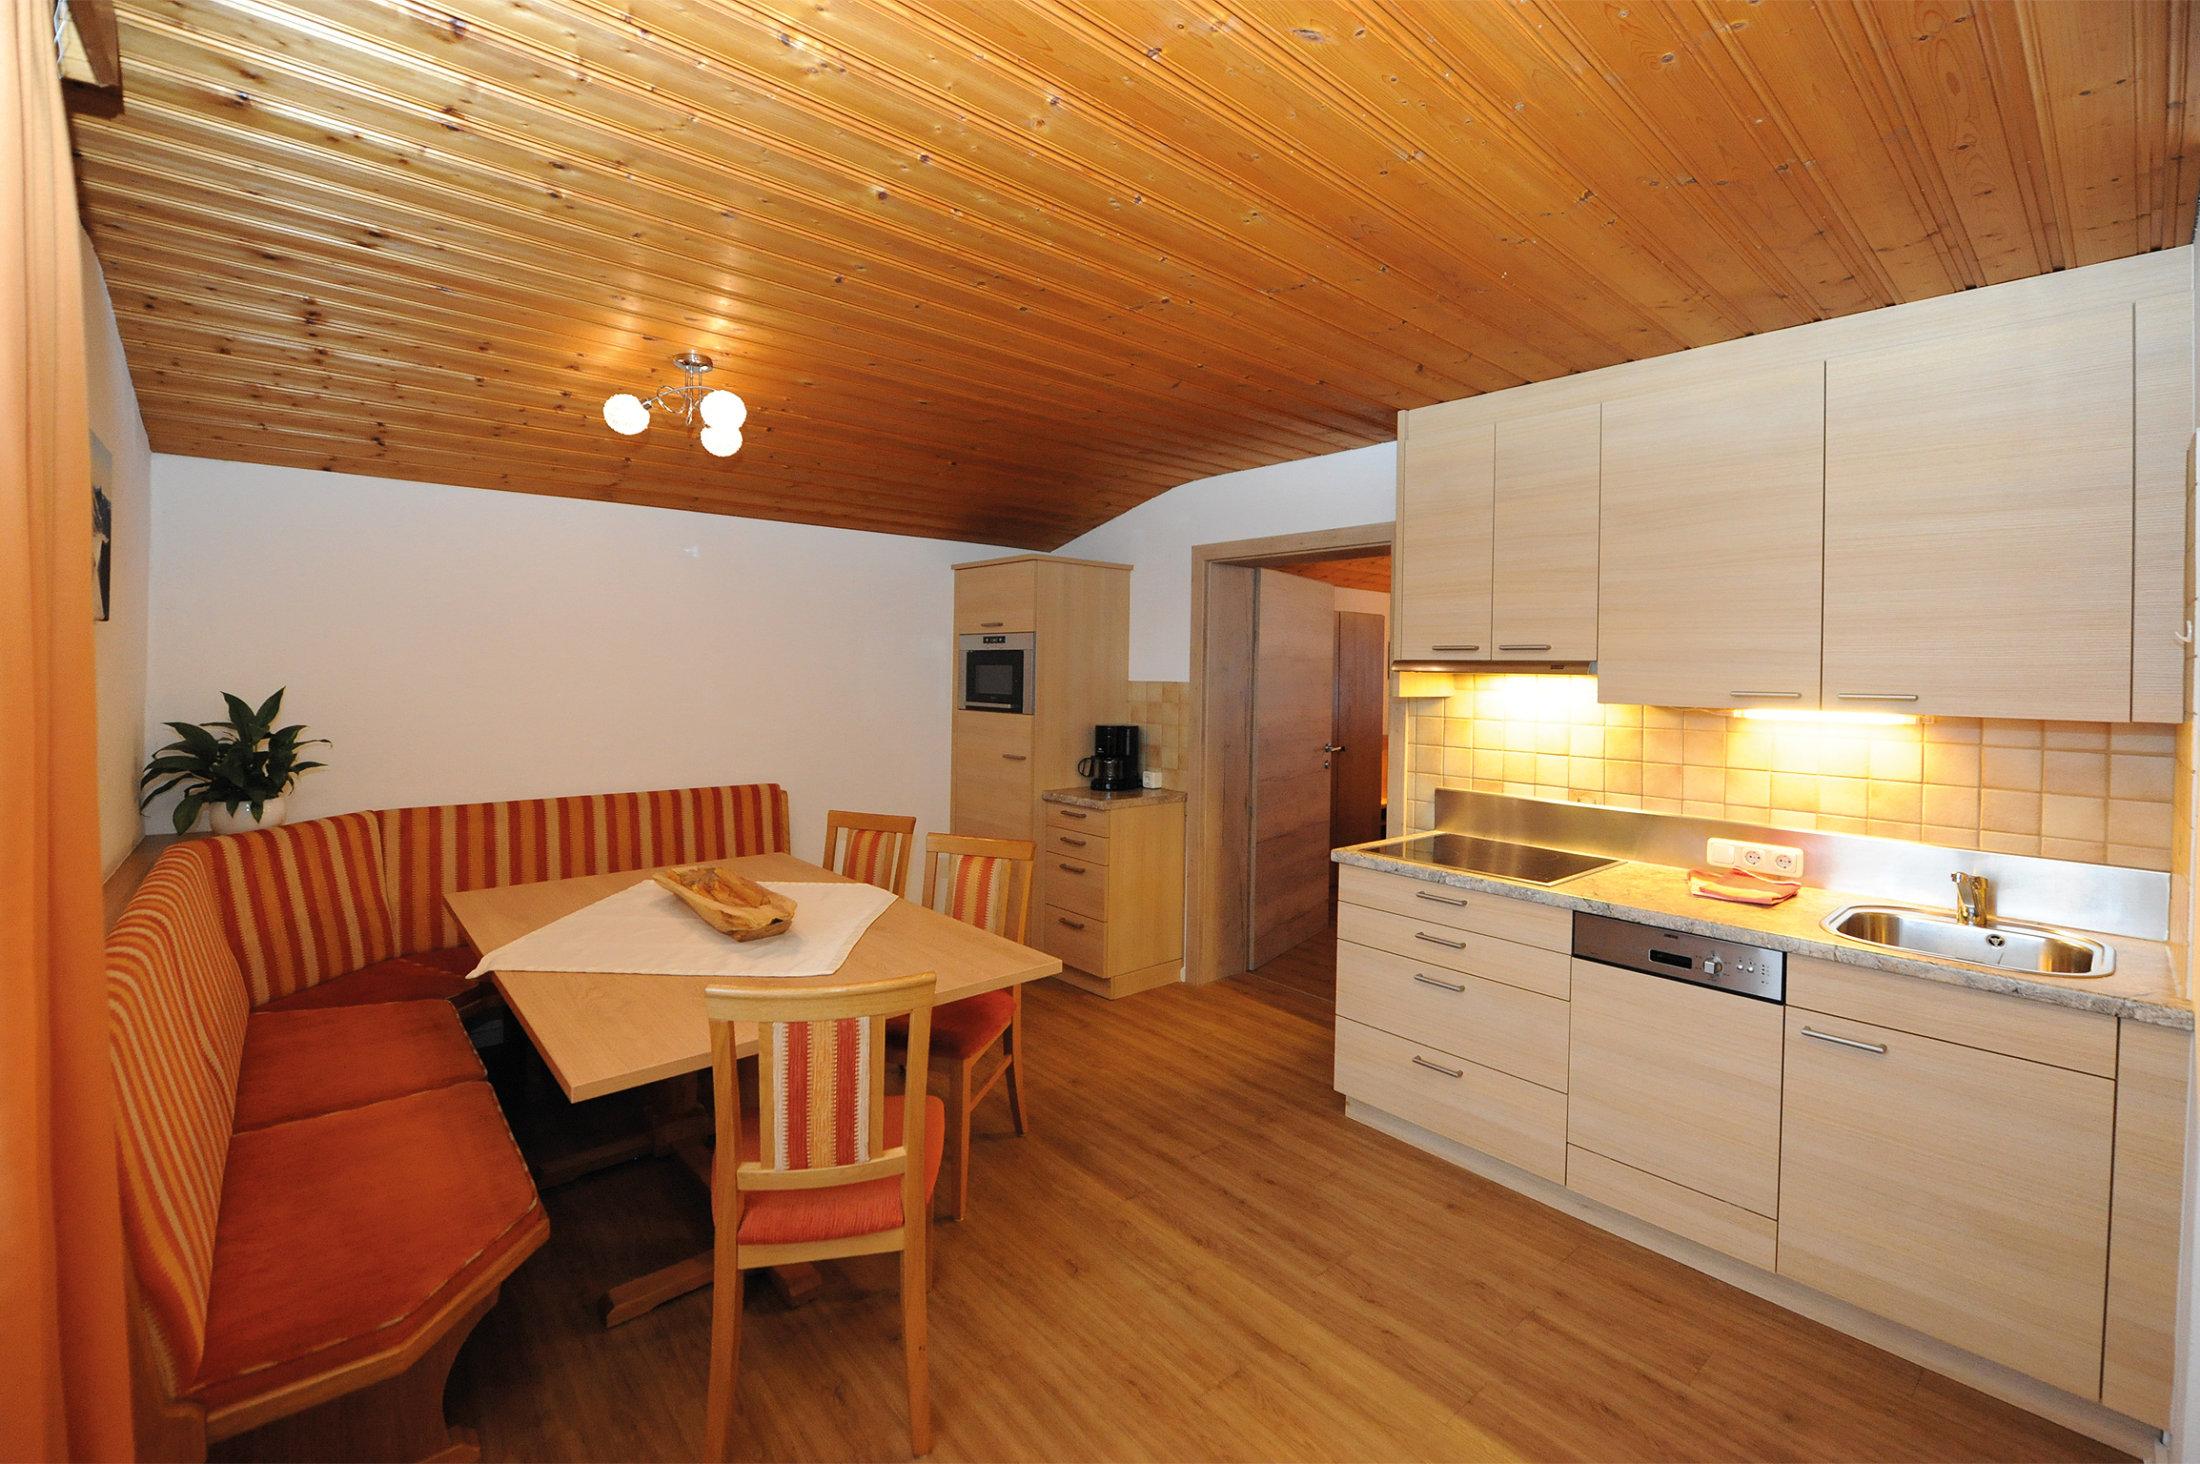 05 Wohnküche